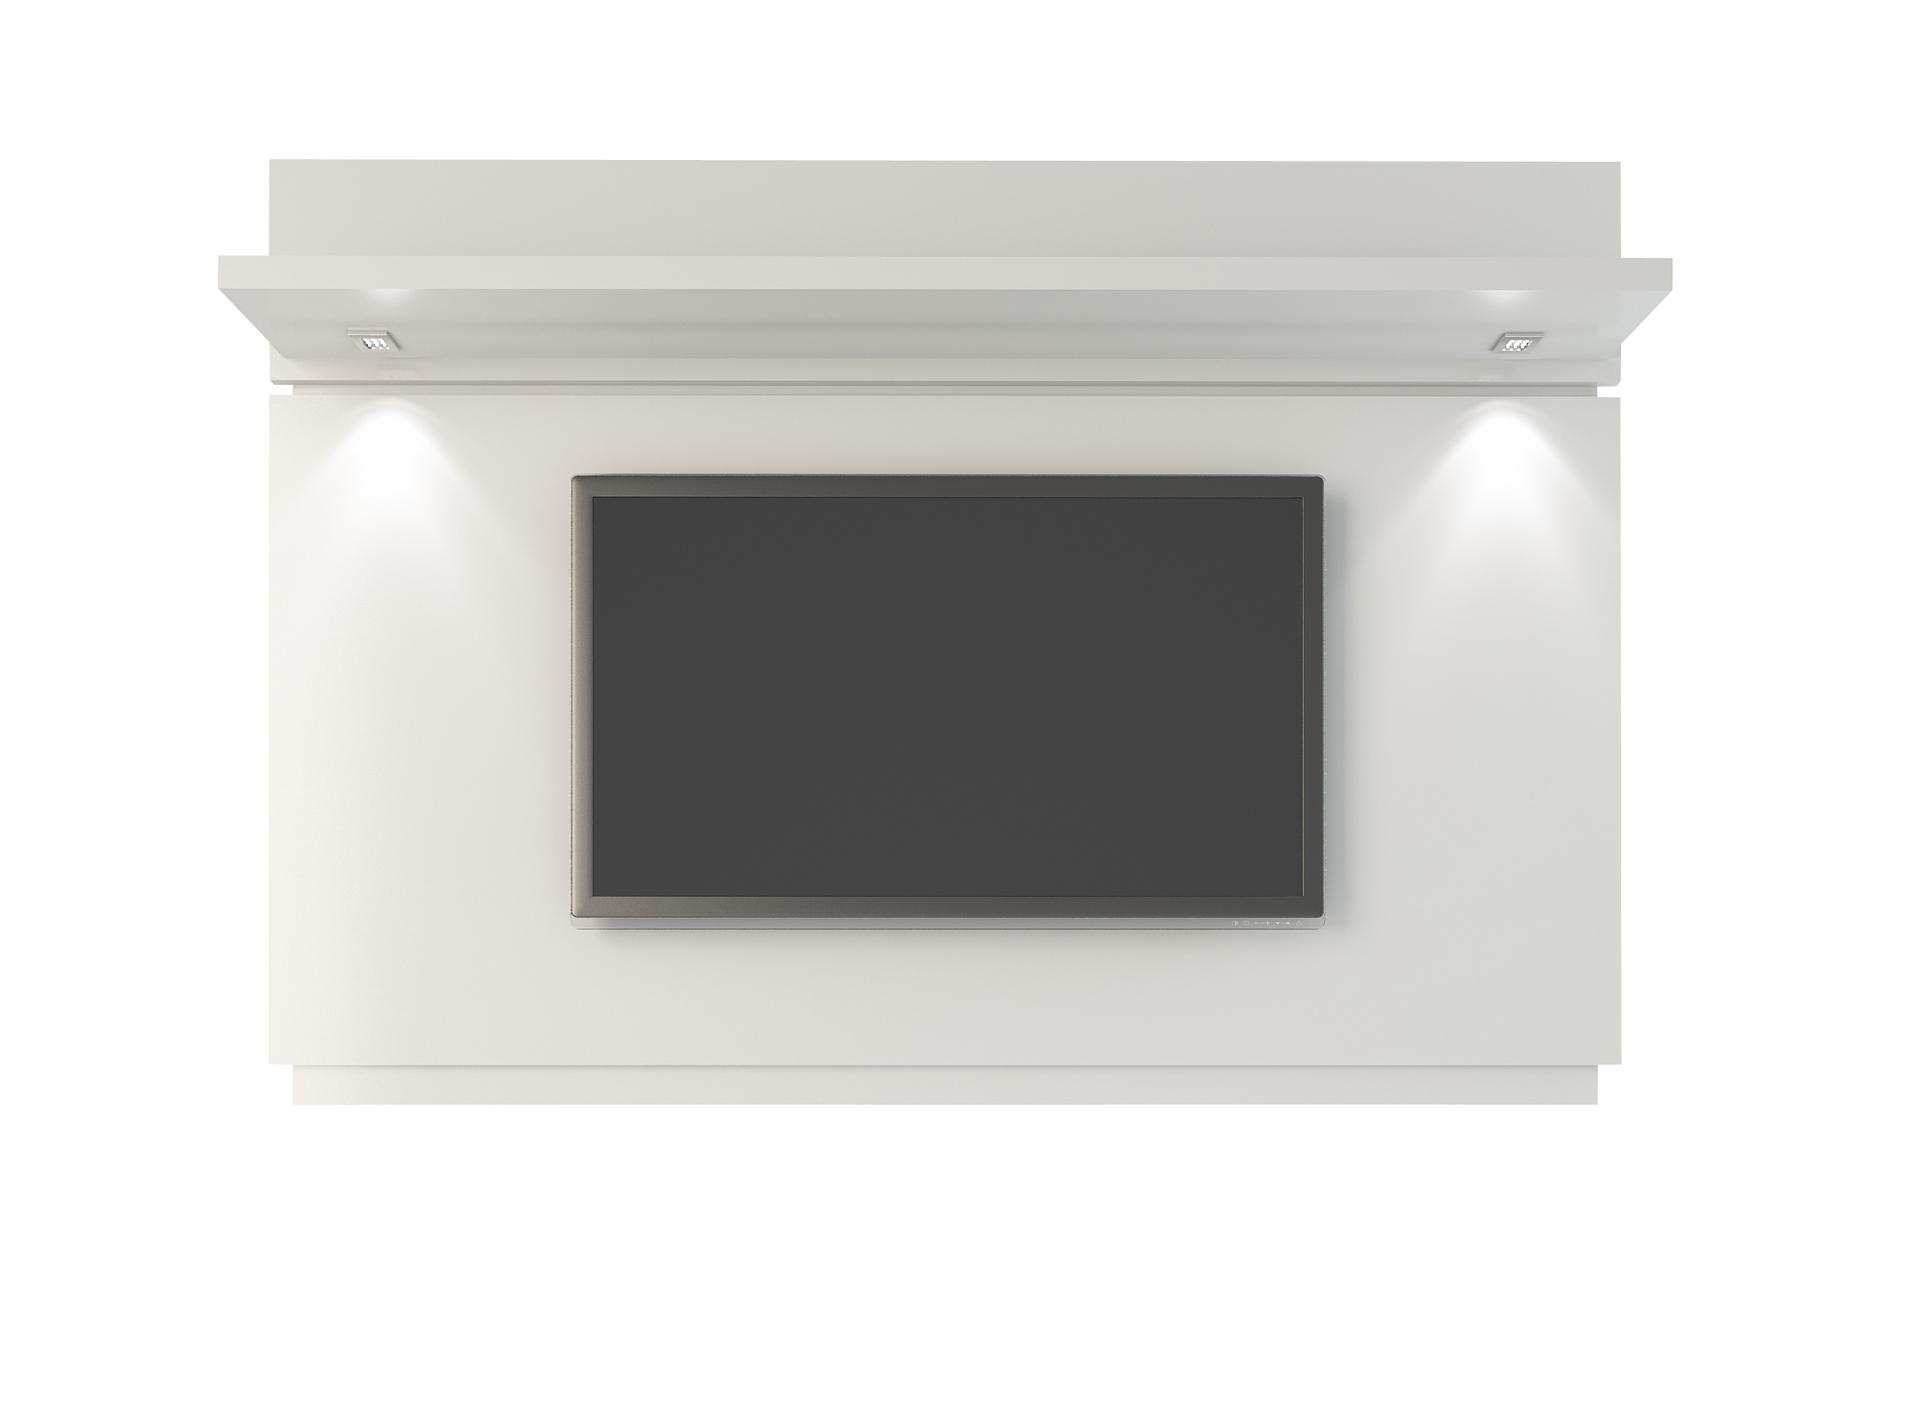 park 1 8 white gloss floating wall tv panel w led lights by manhattan comfort. Black Bedroom Furniture Sets. Home Design Ideas